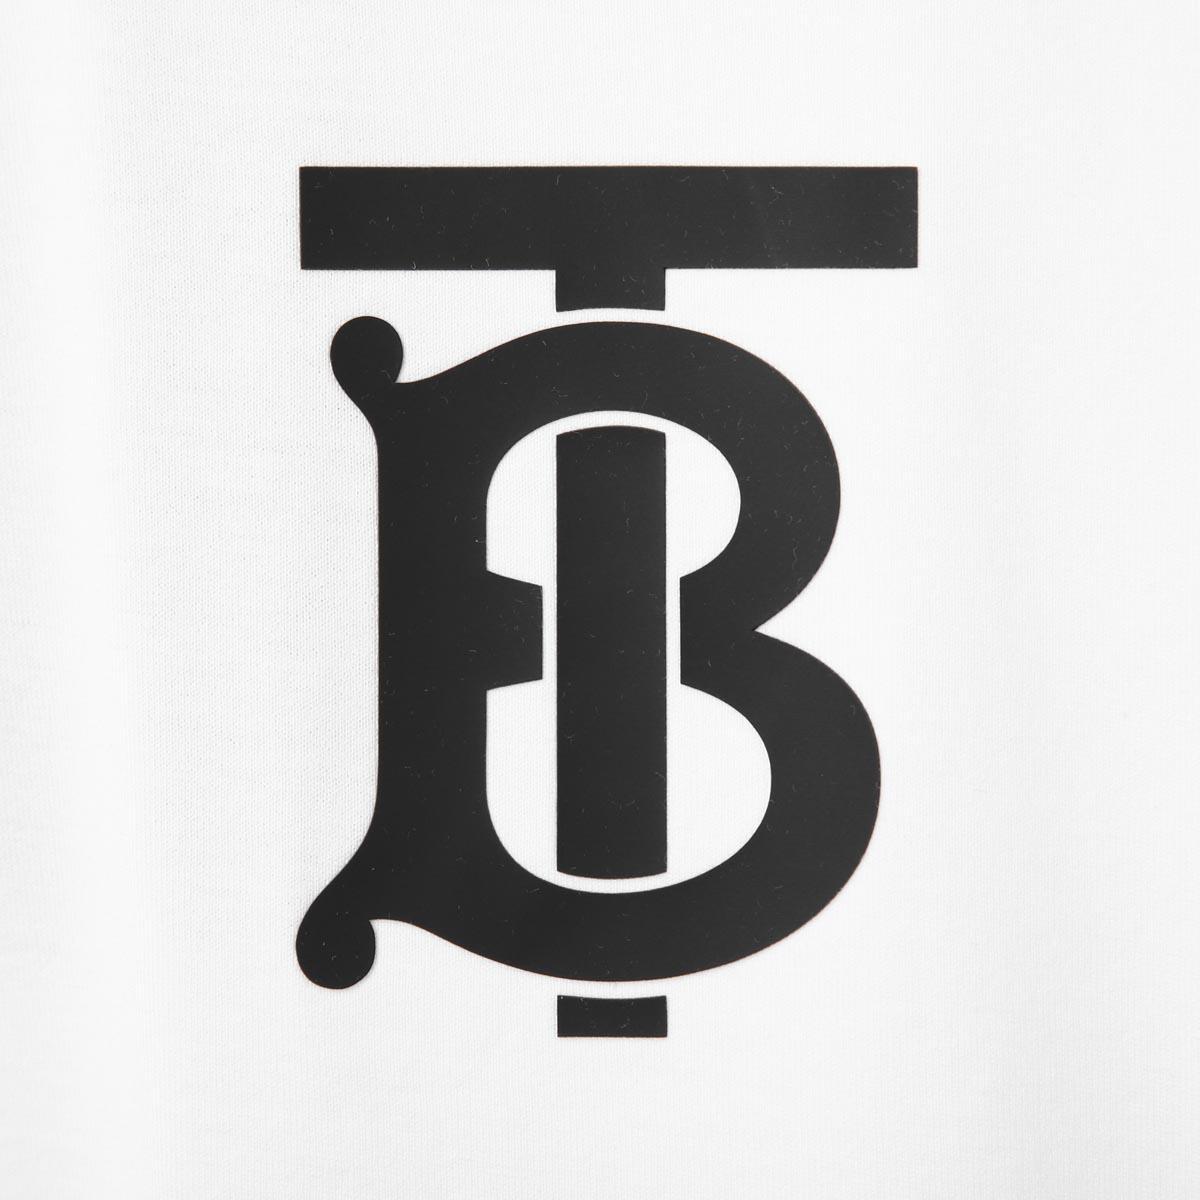 BURBERRY バーバリー クルーネック 長袖Tシャツ/LONG-SLEEVE MONOGRAM MOTIF COTTON TOP メンズ